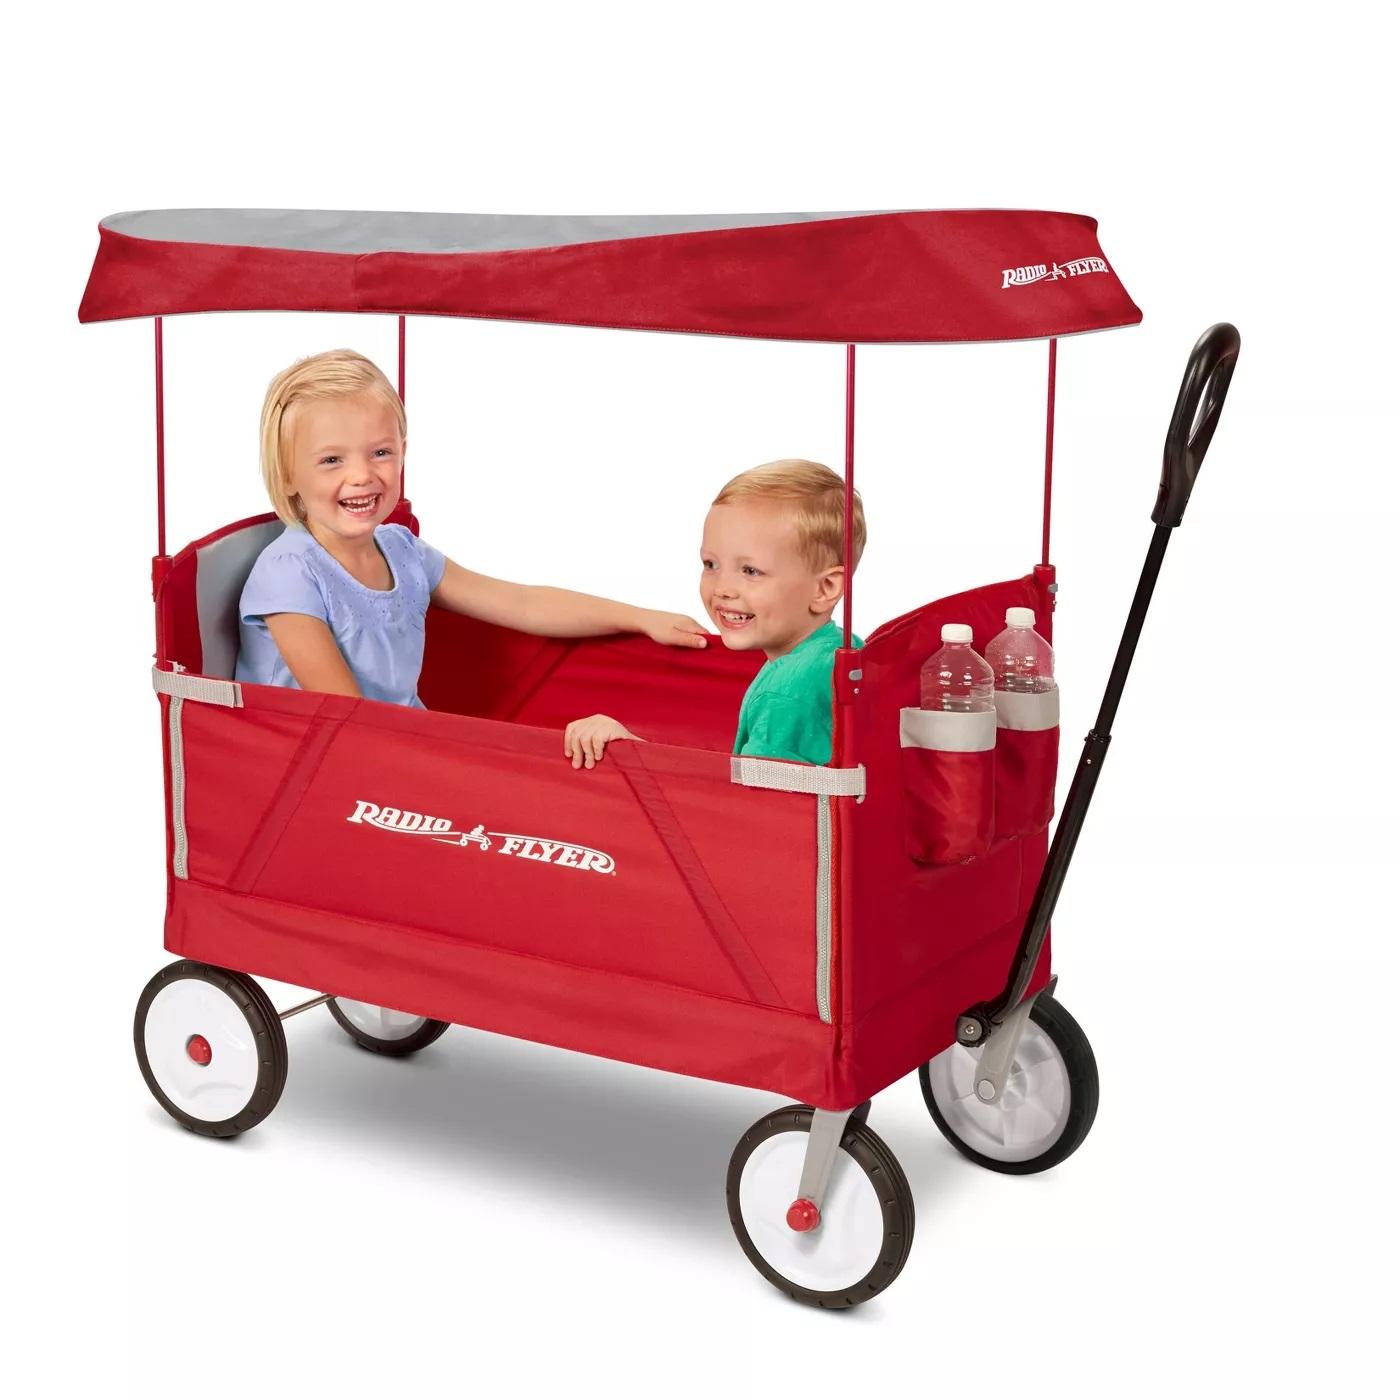 wagons image